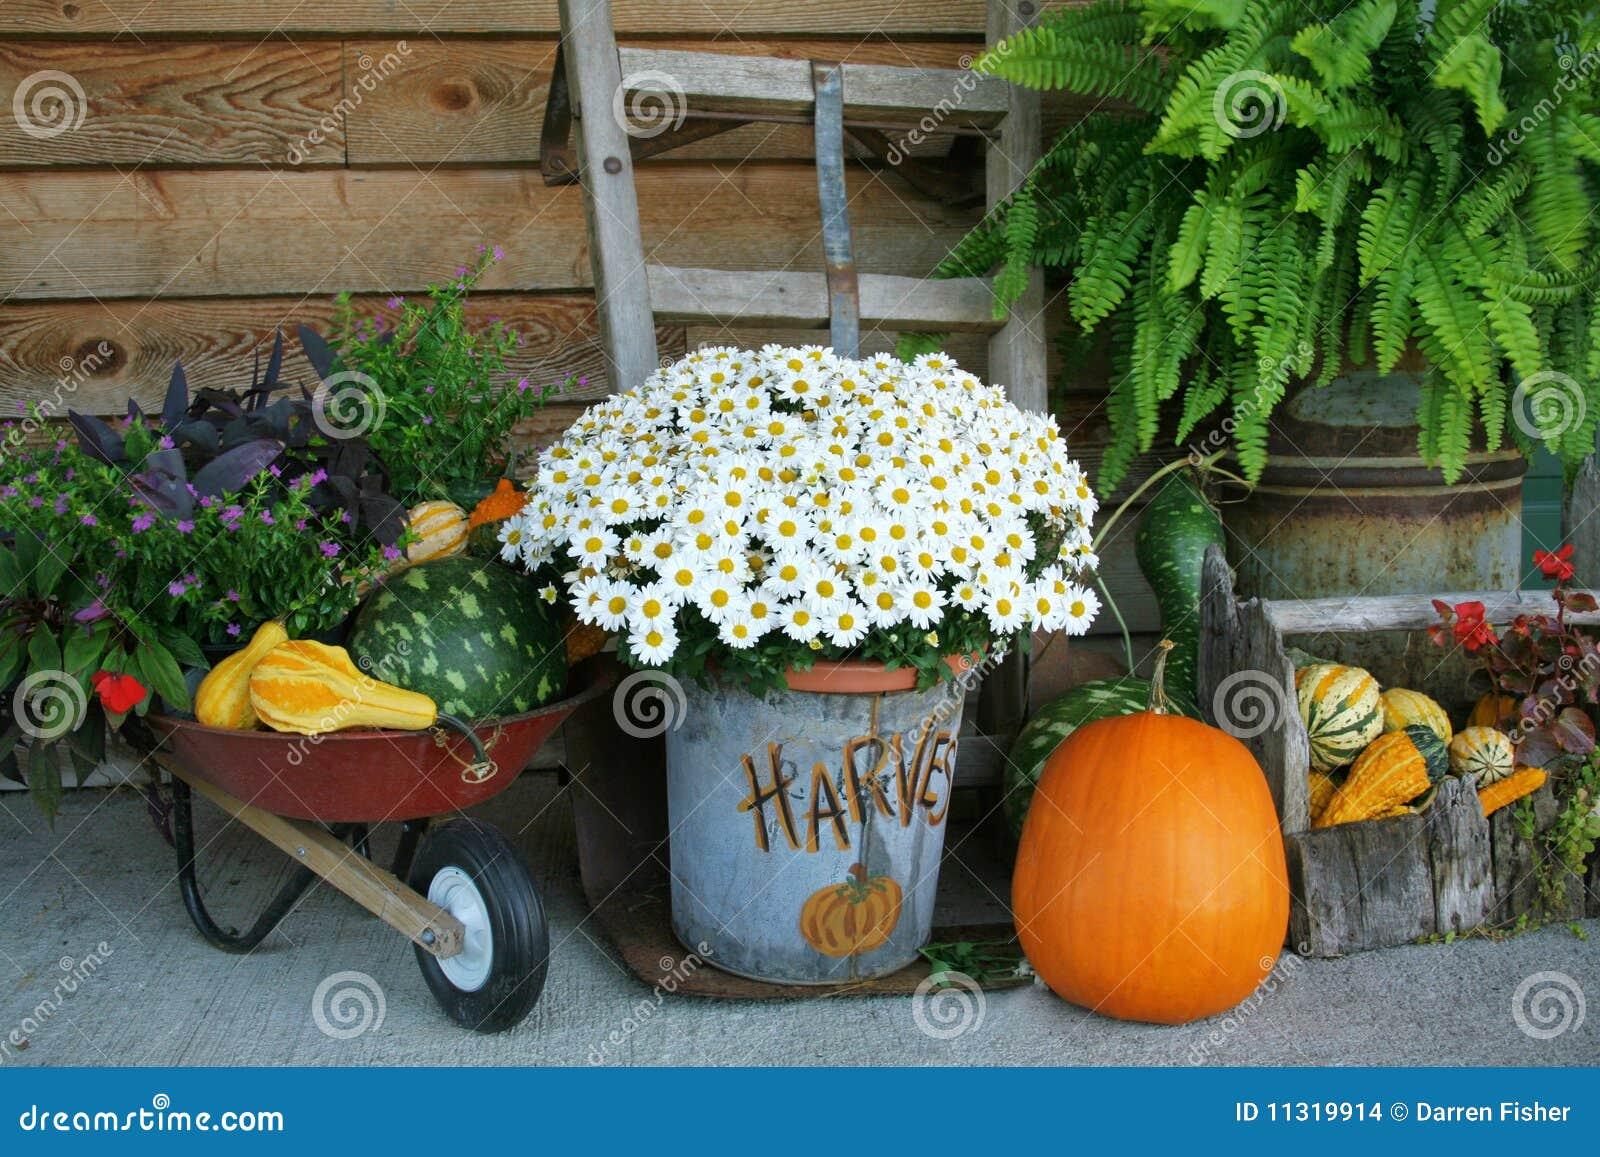 flowers gourds harvest - Harvest Decorations